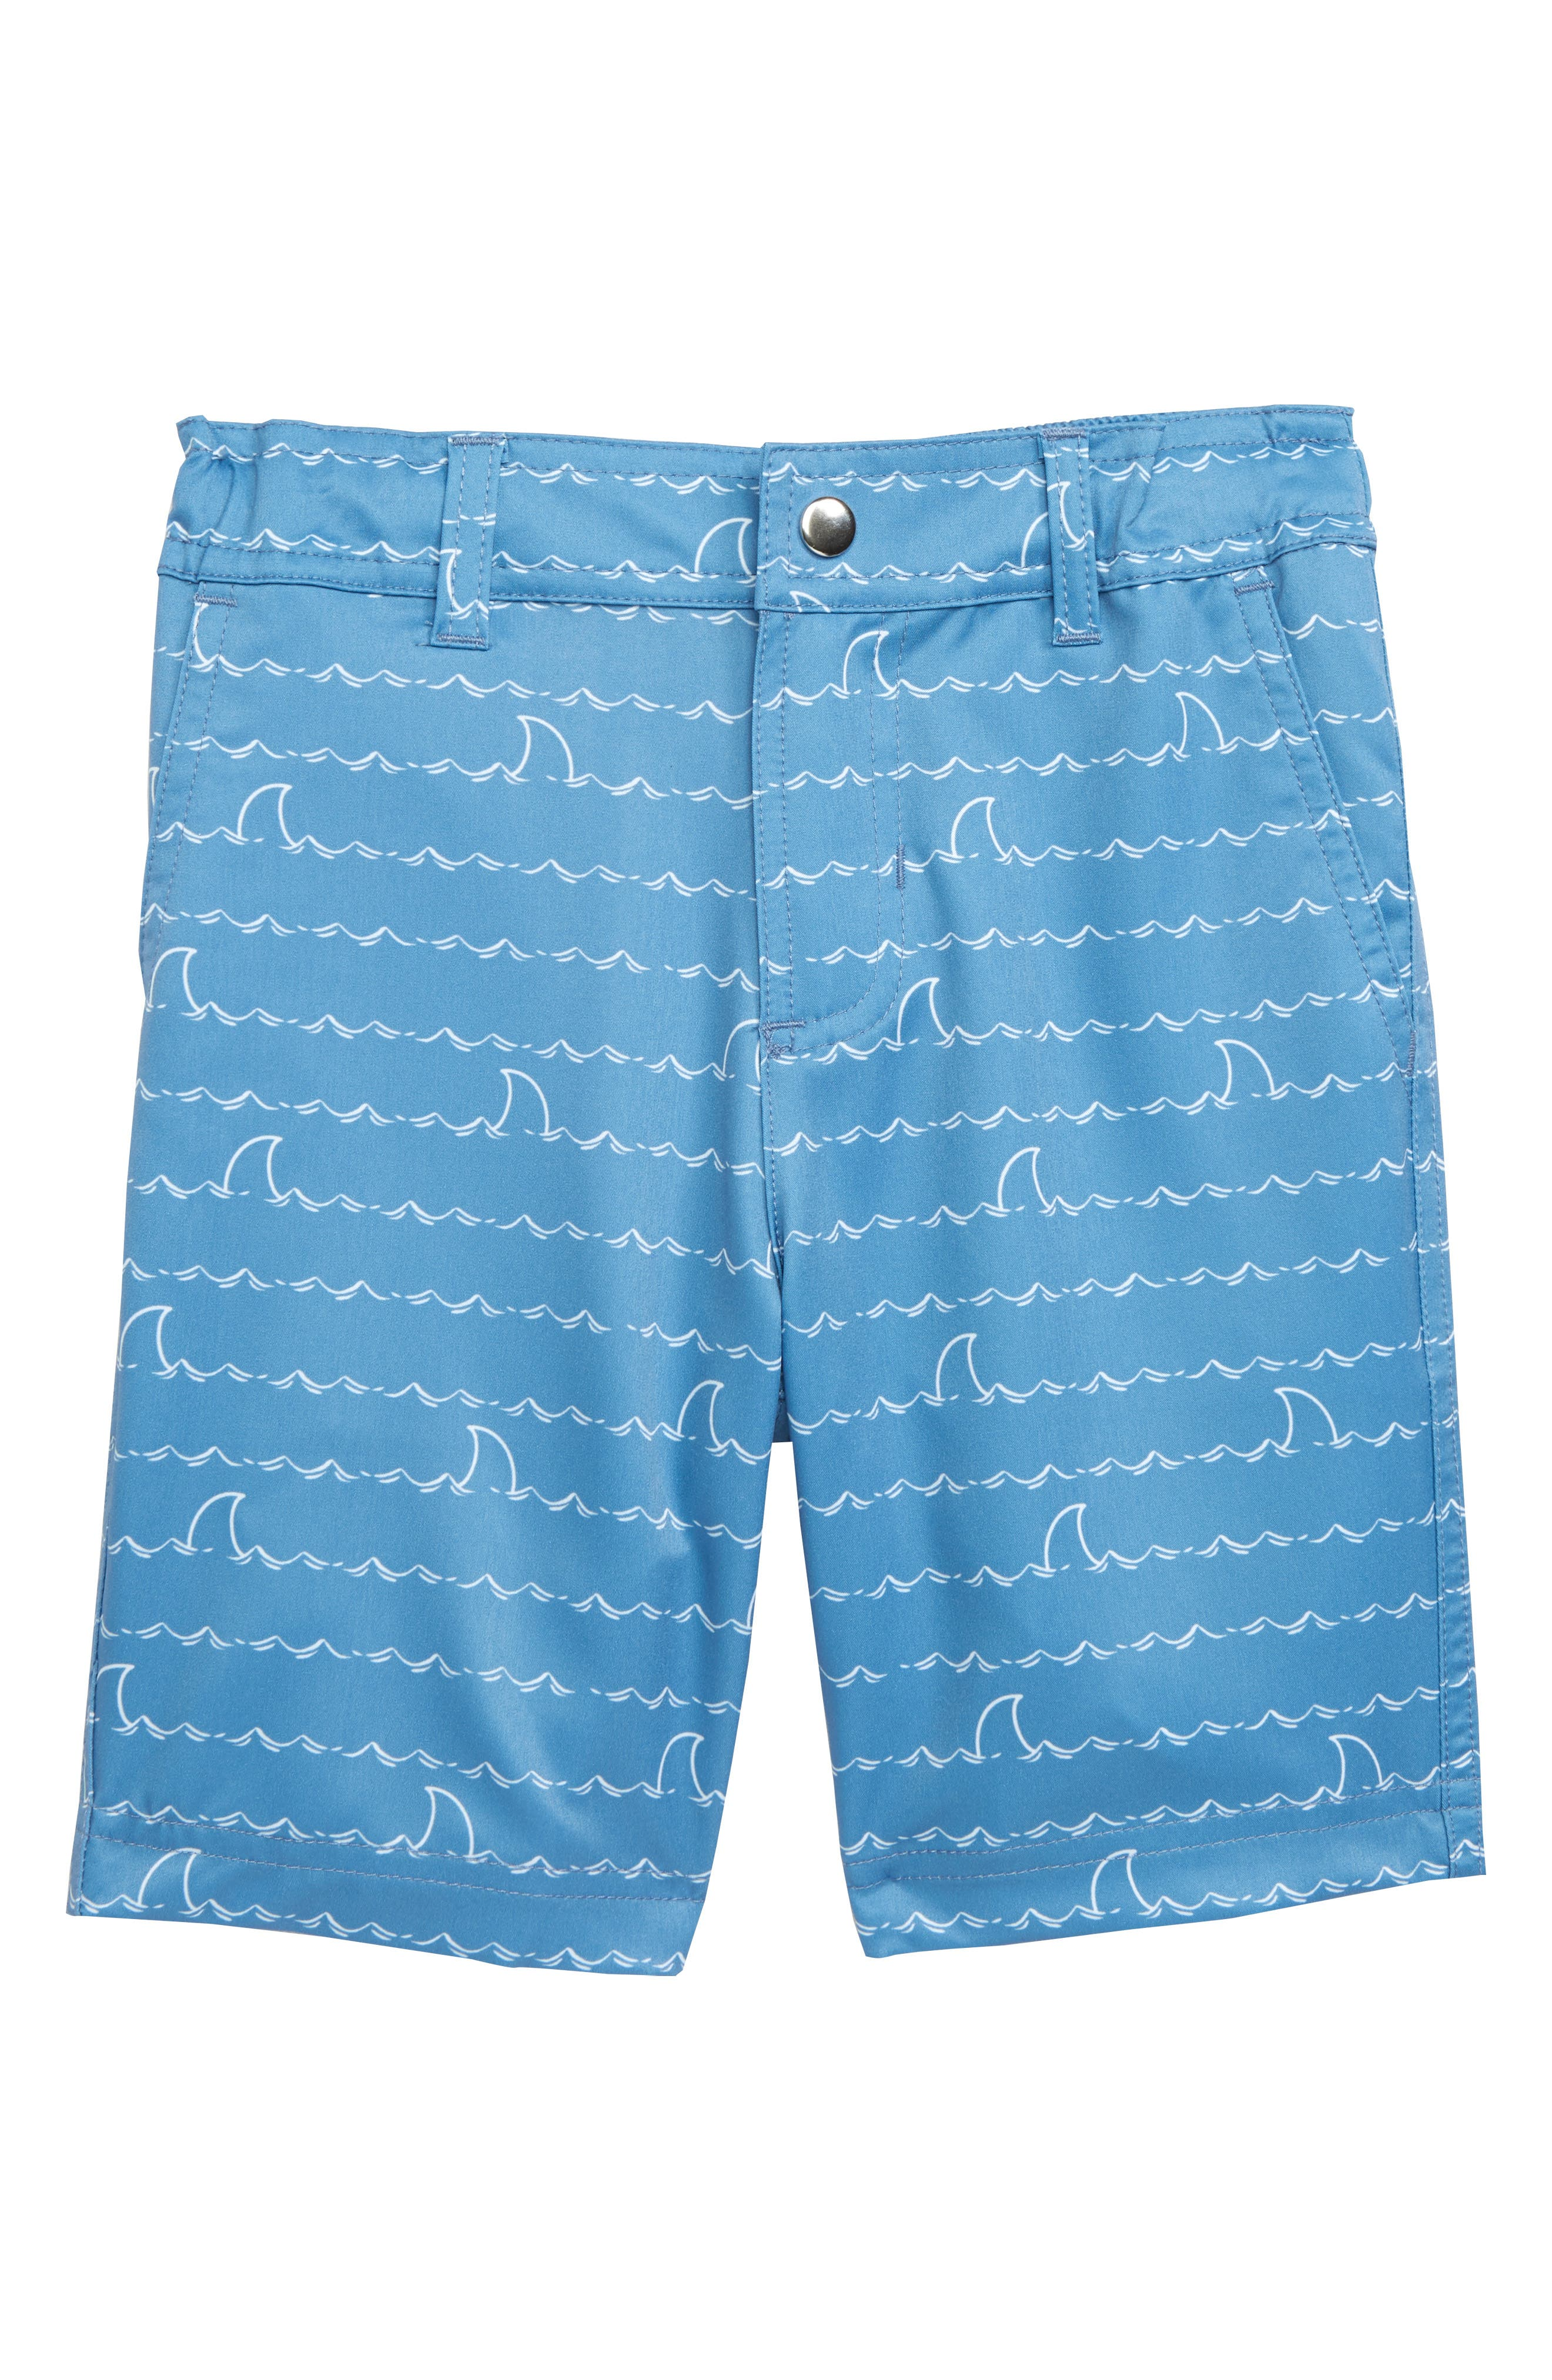 HATLEY Shark Fin Quick Drying Shorts, Main, color, 400